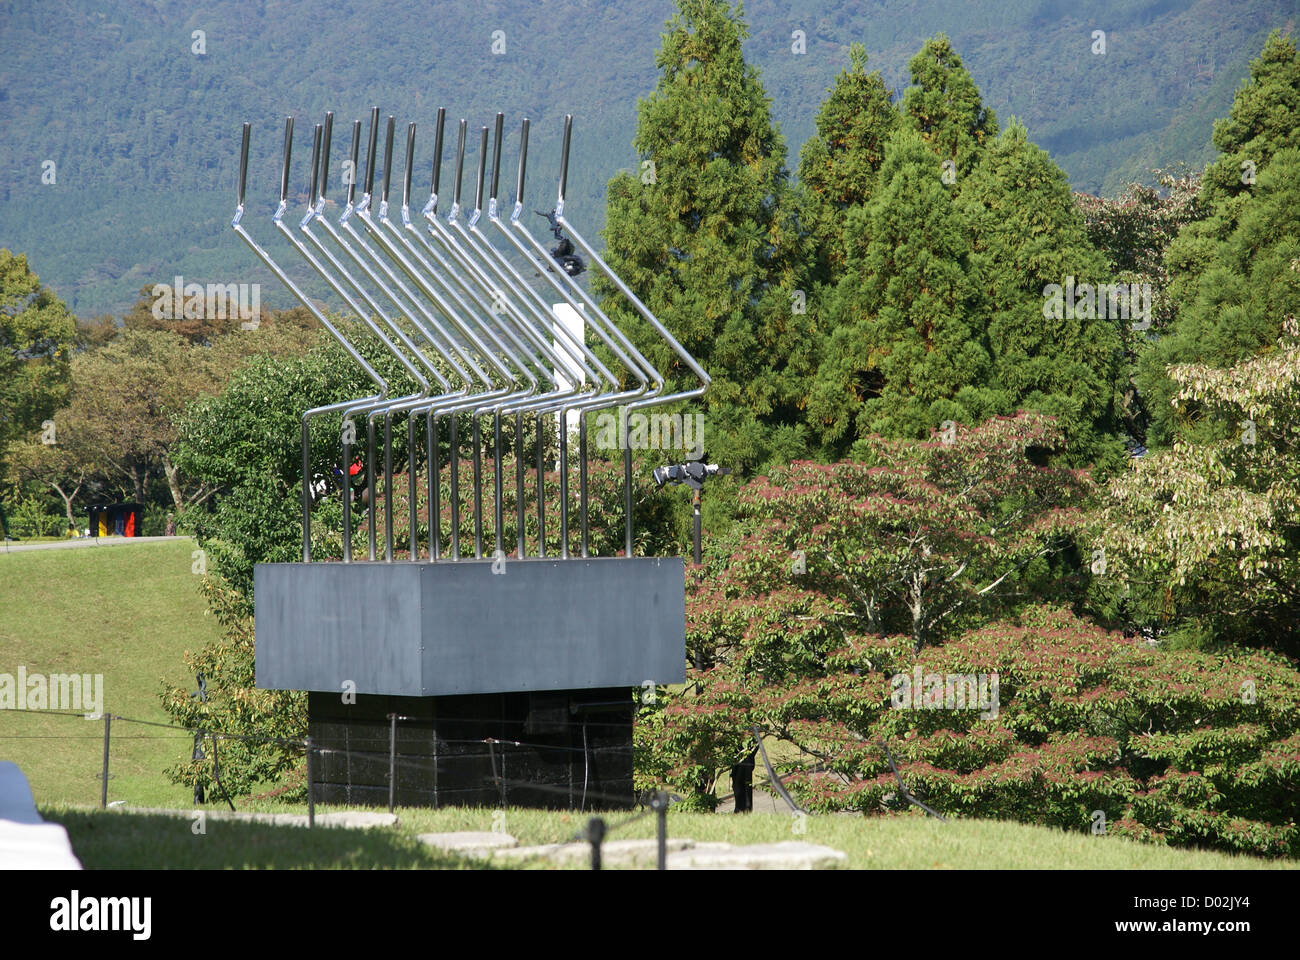 Japan, Honshu Island, Kanagawa Prefecture, Fuji Hakone National Park, Hakone Open-Air Museum - Stock Image